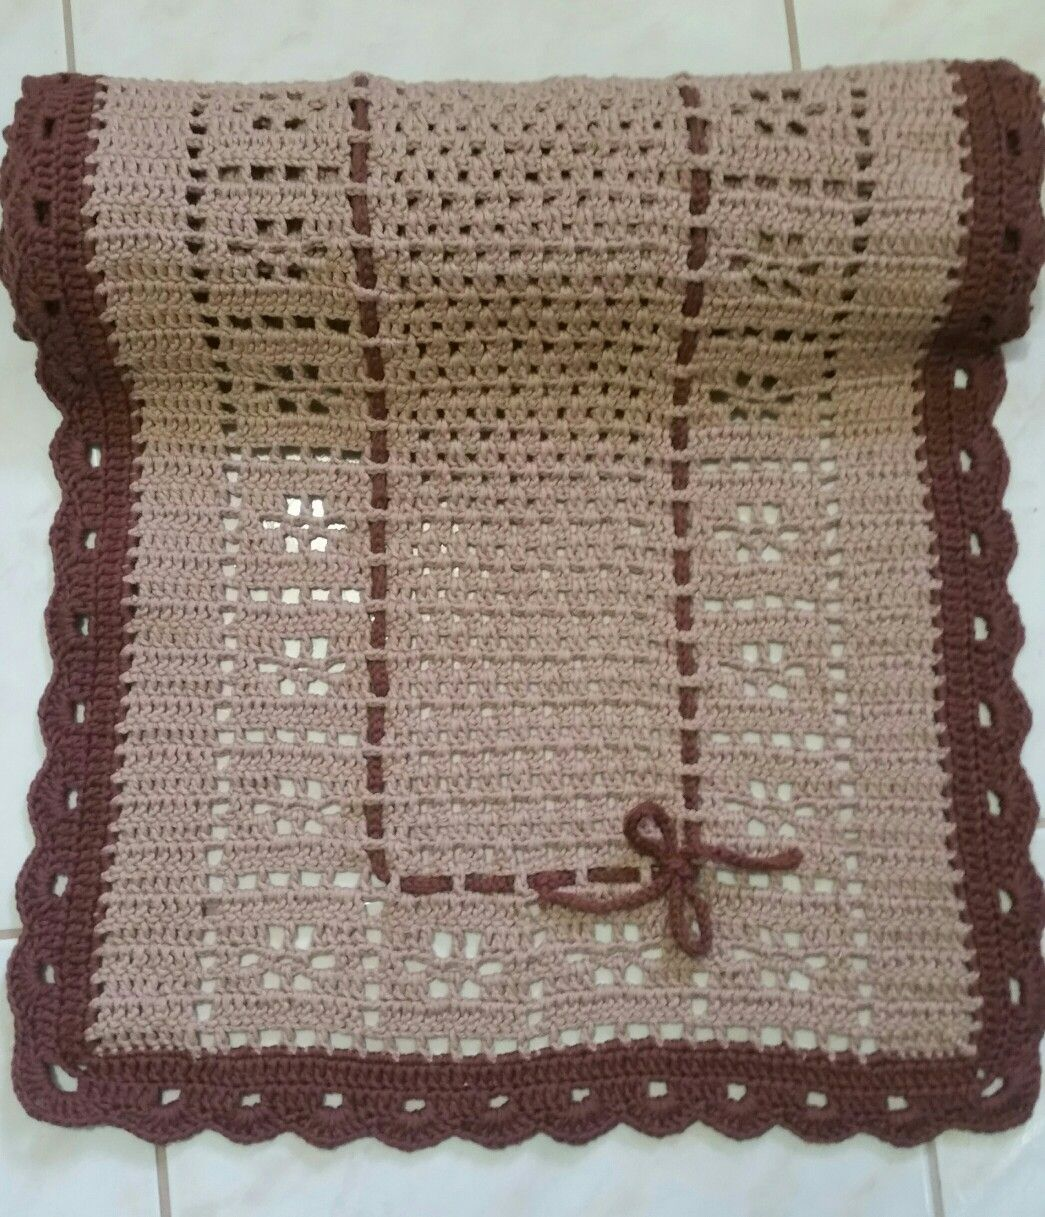 Pin de ines pacheco en patrones de ganchillo   Pinterest   Tapetes ...